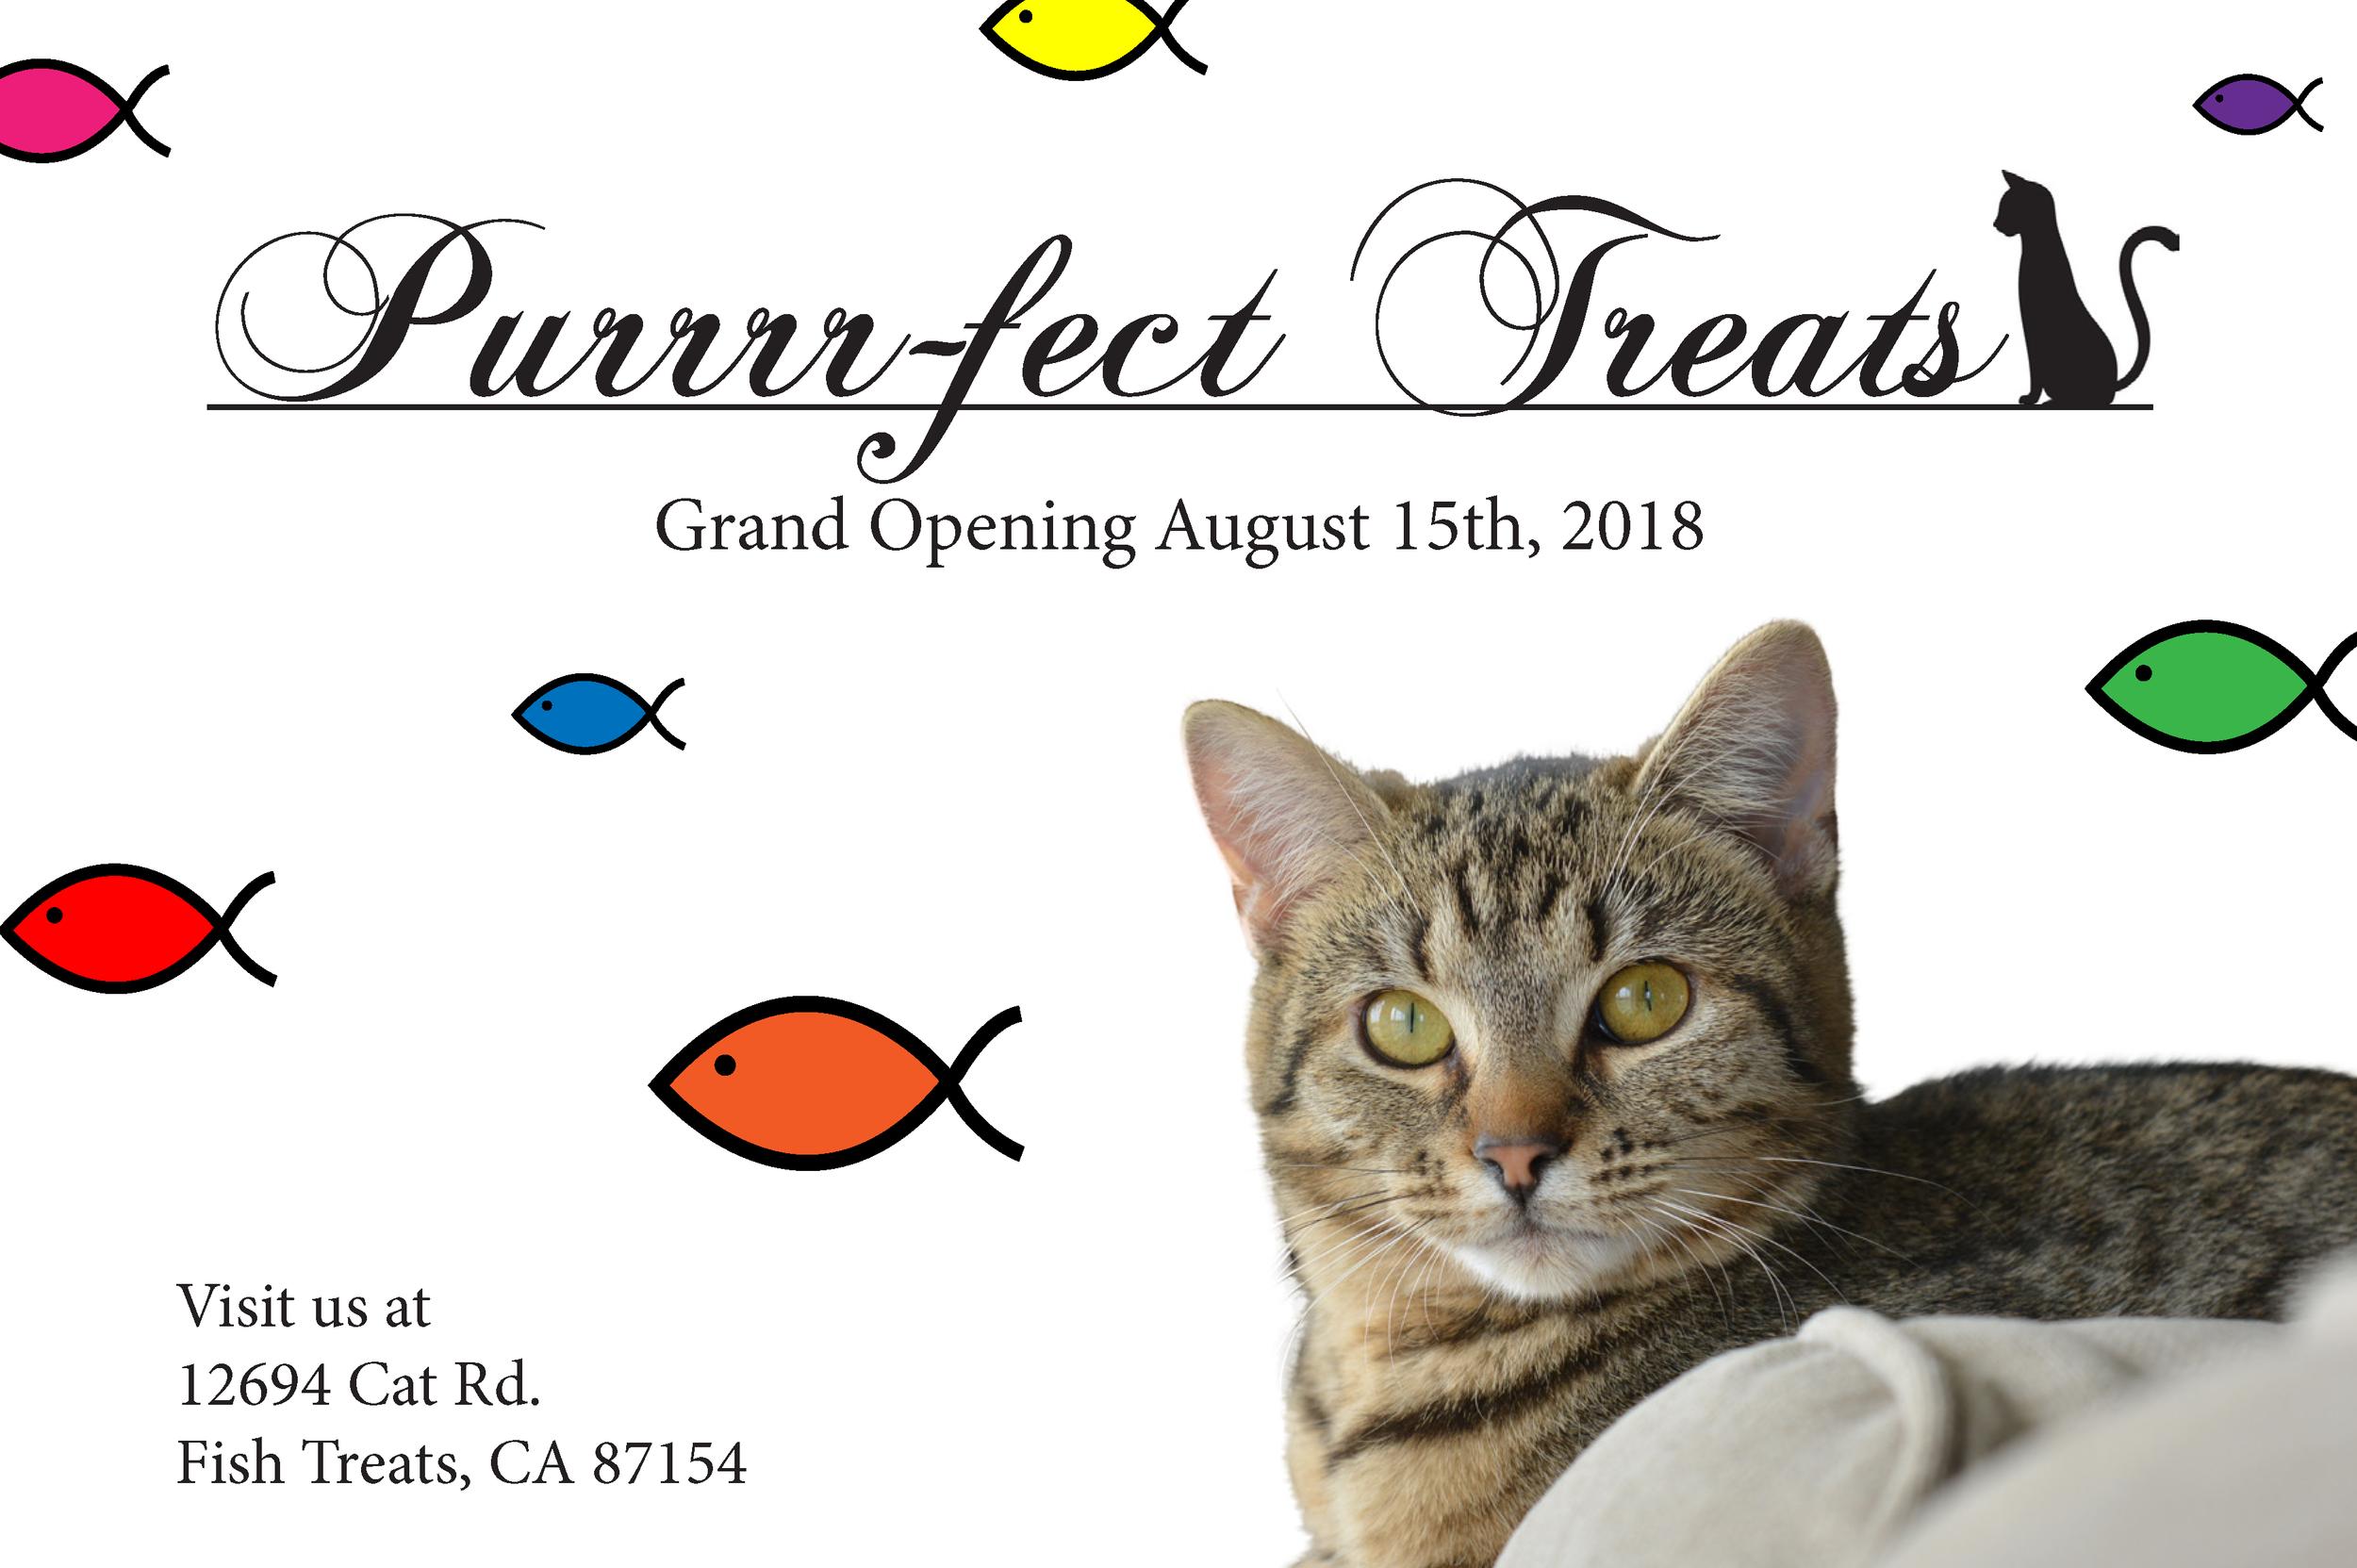 Cat Treats Opening Store